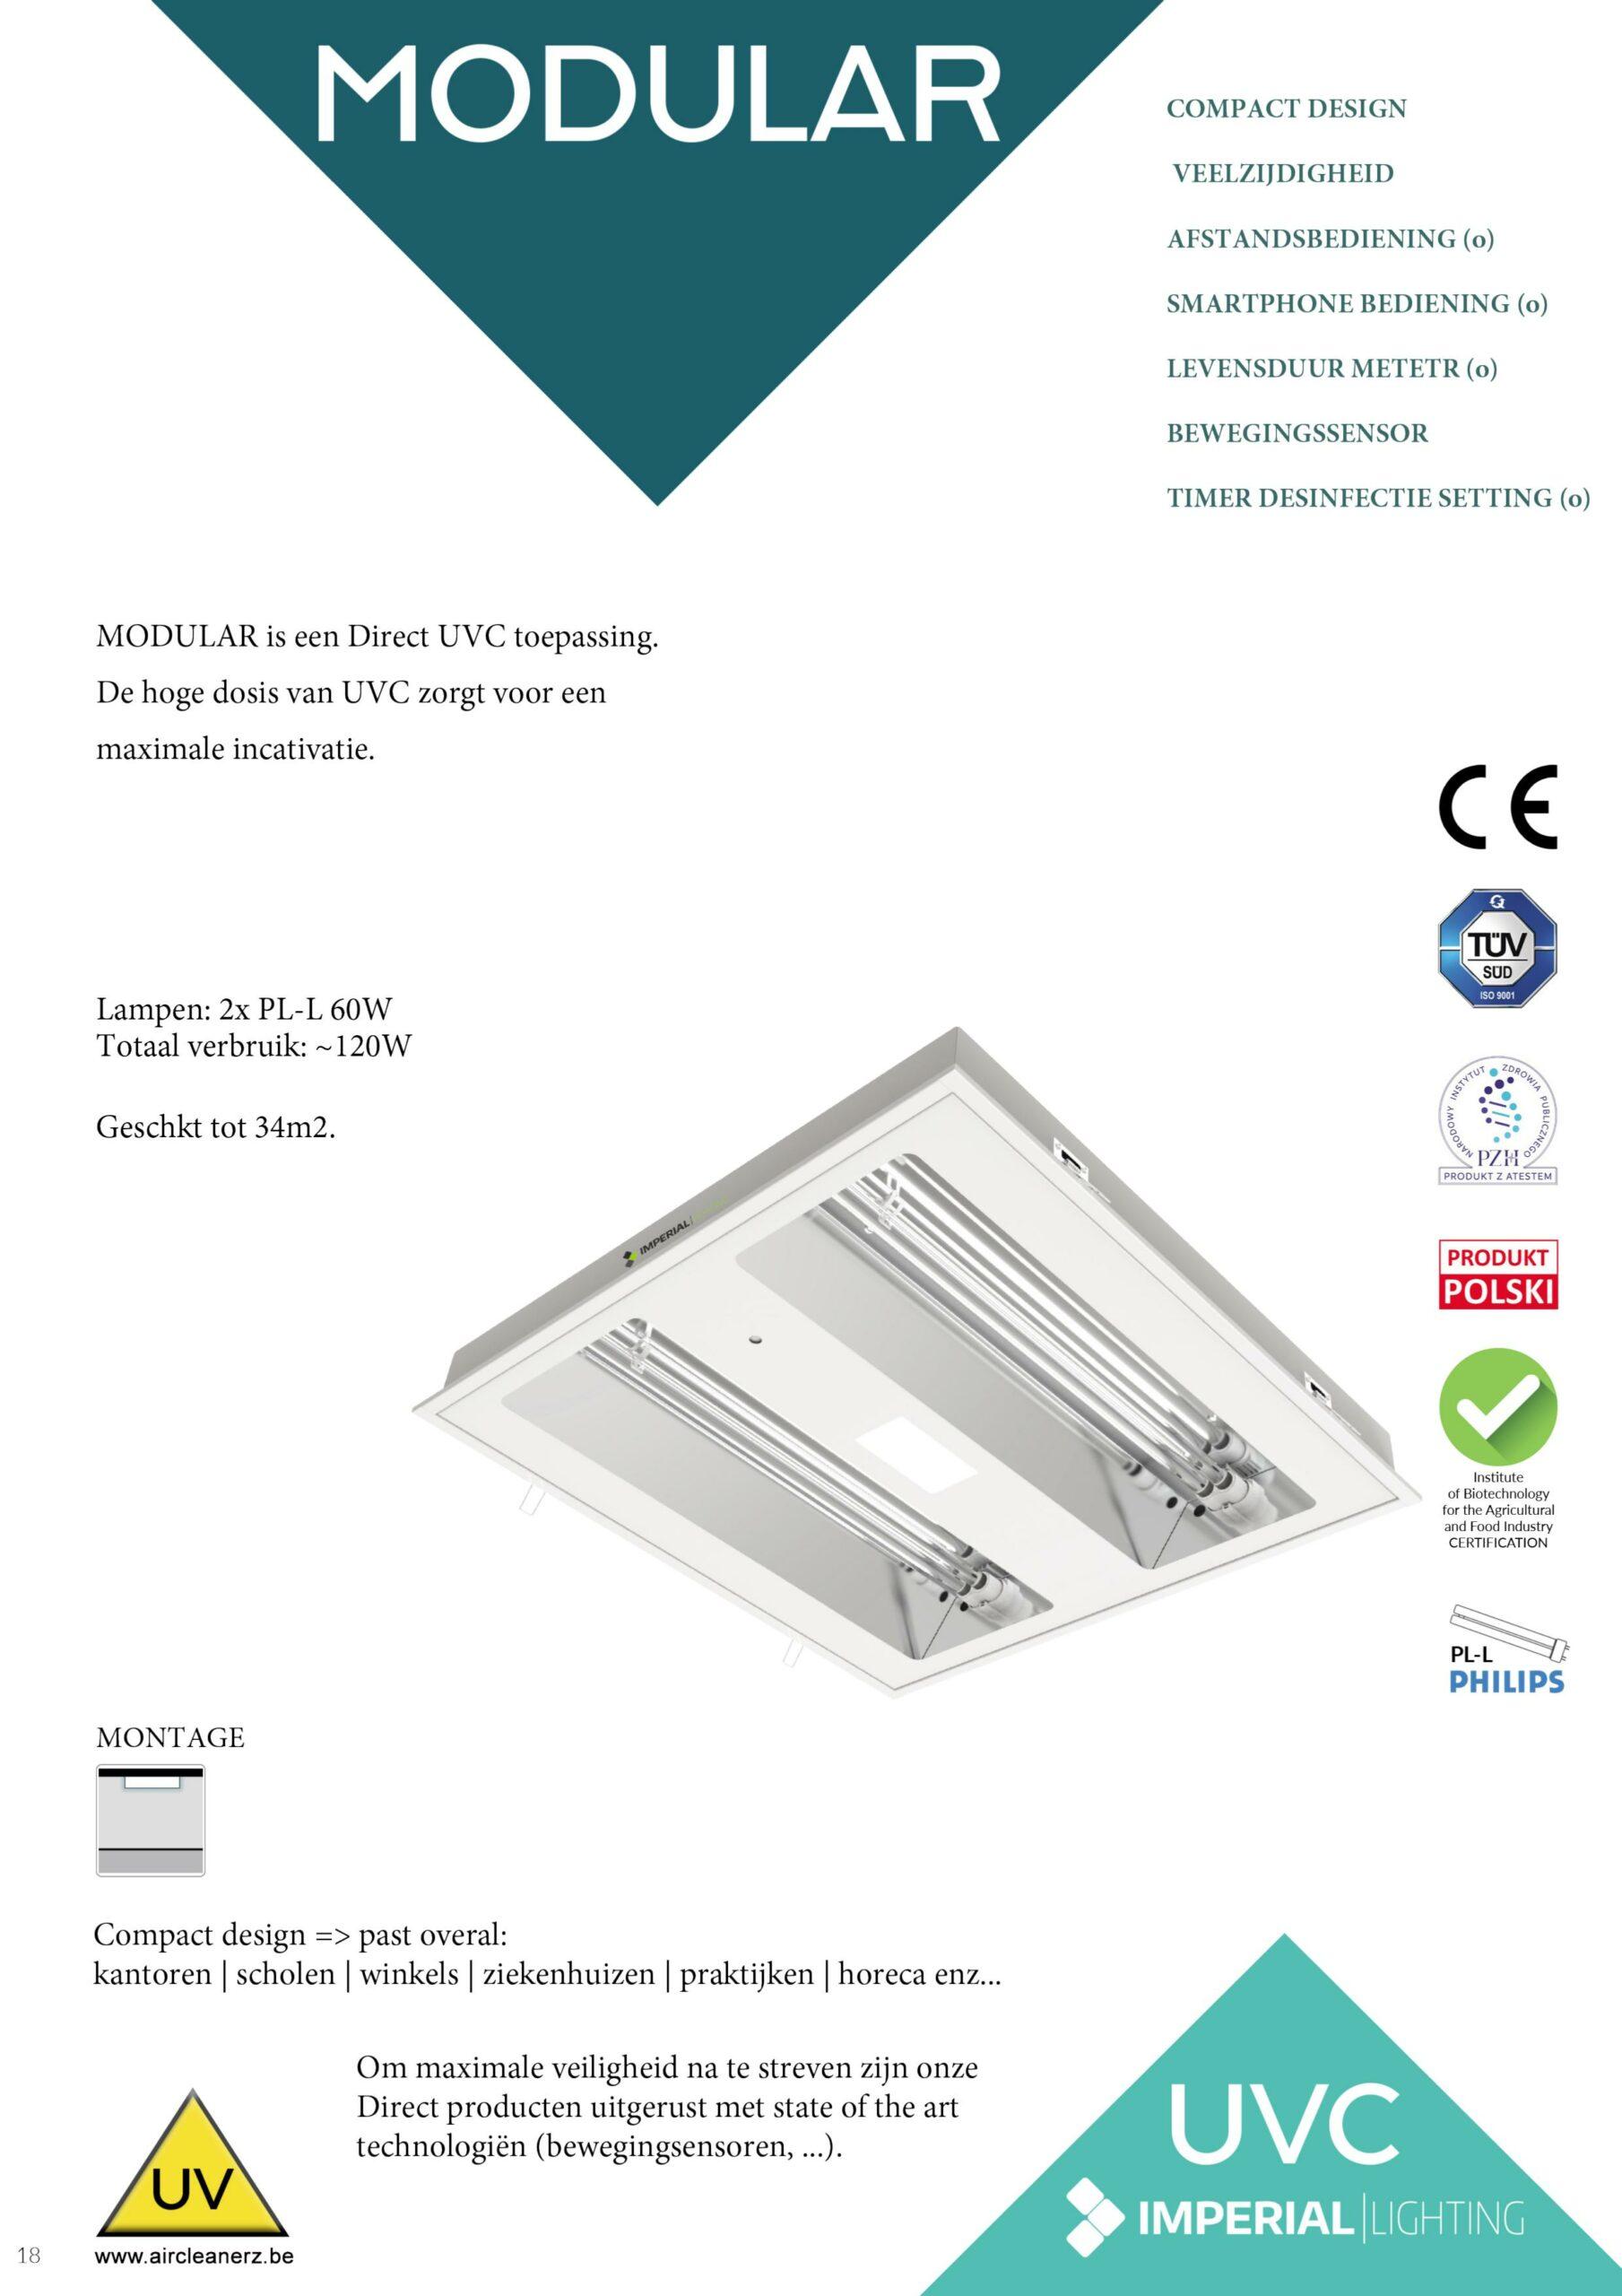 aircleanerz, zuivere lucht, gezuiverde lucht, corona, uv-licht, antibacterieel, modular type